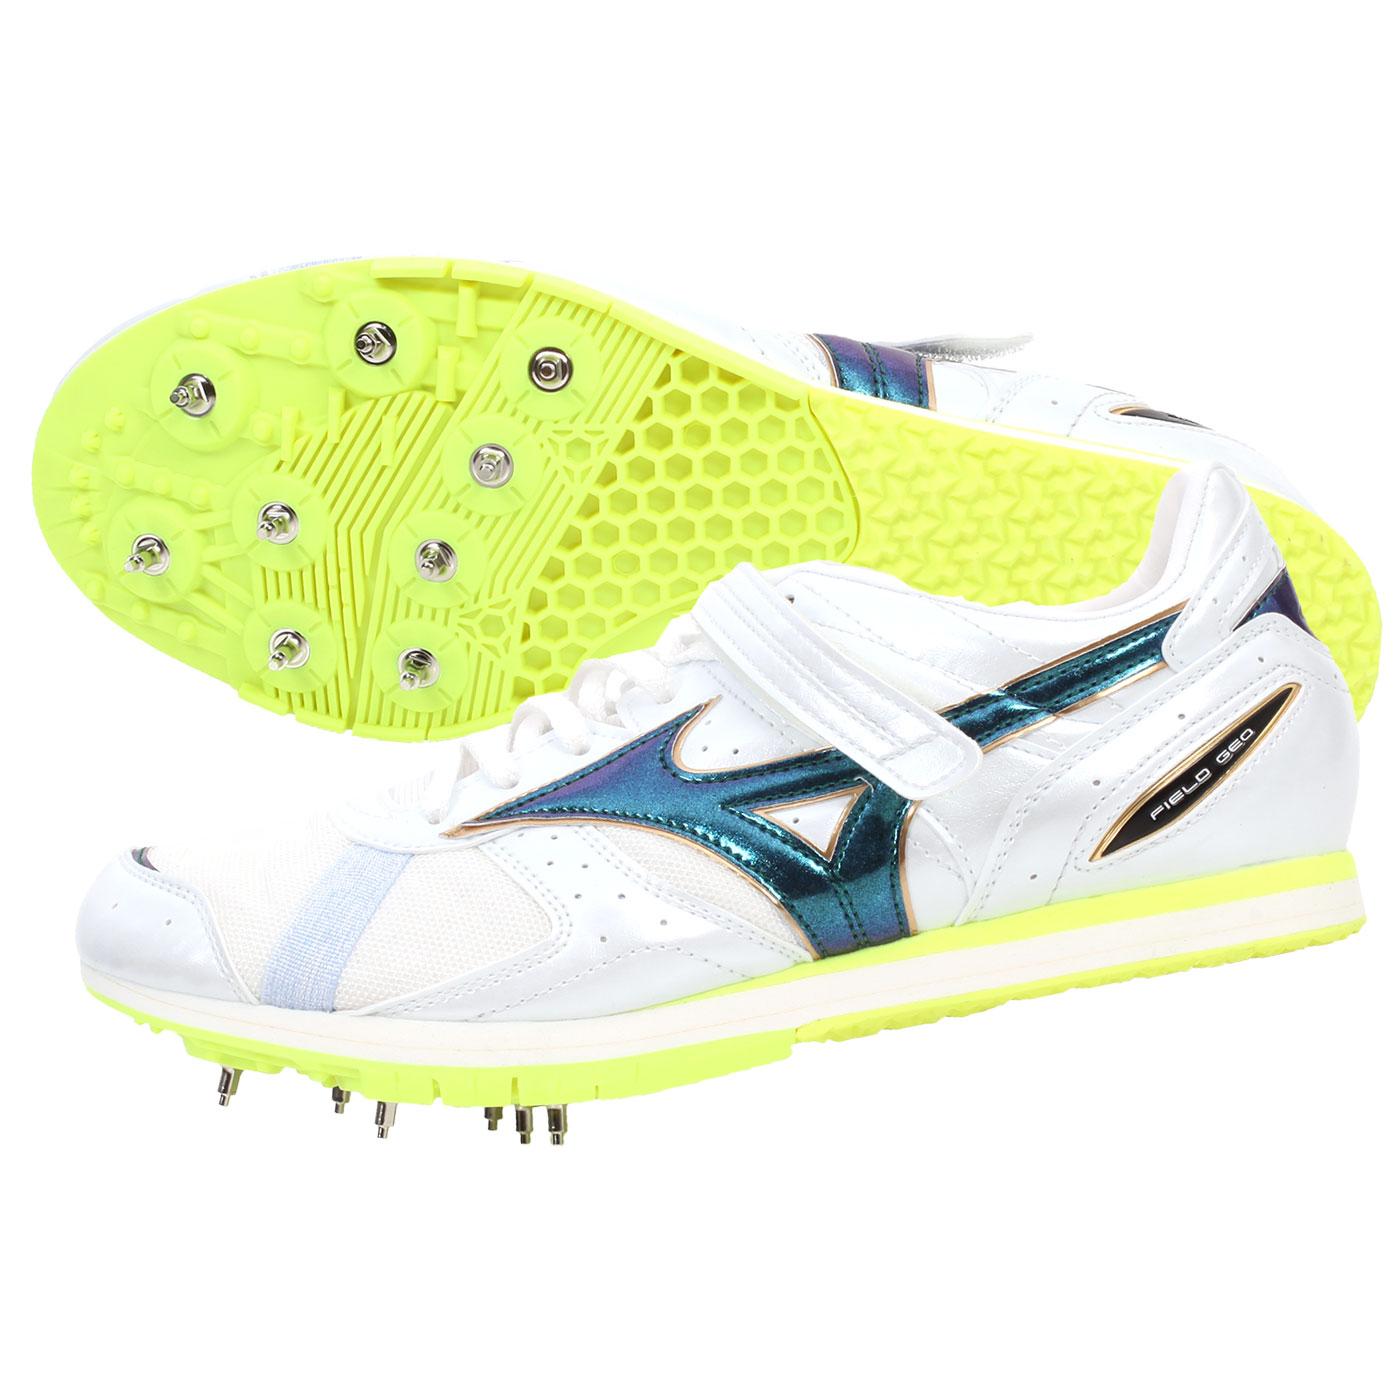 MIZUNO 日製田徑釘鞋 U1GA154136 - 螢光黃白